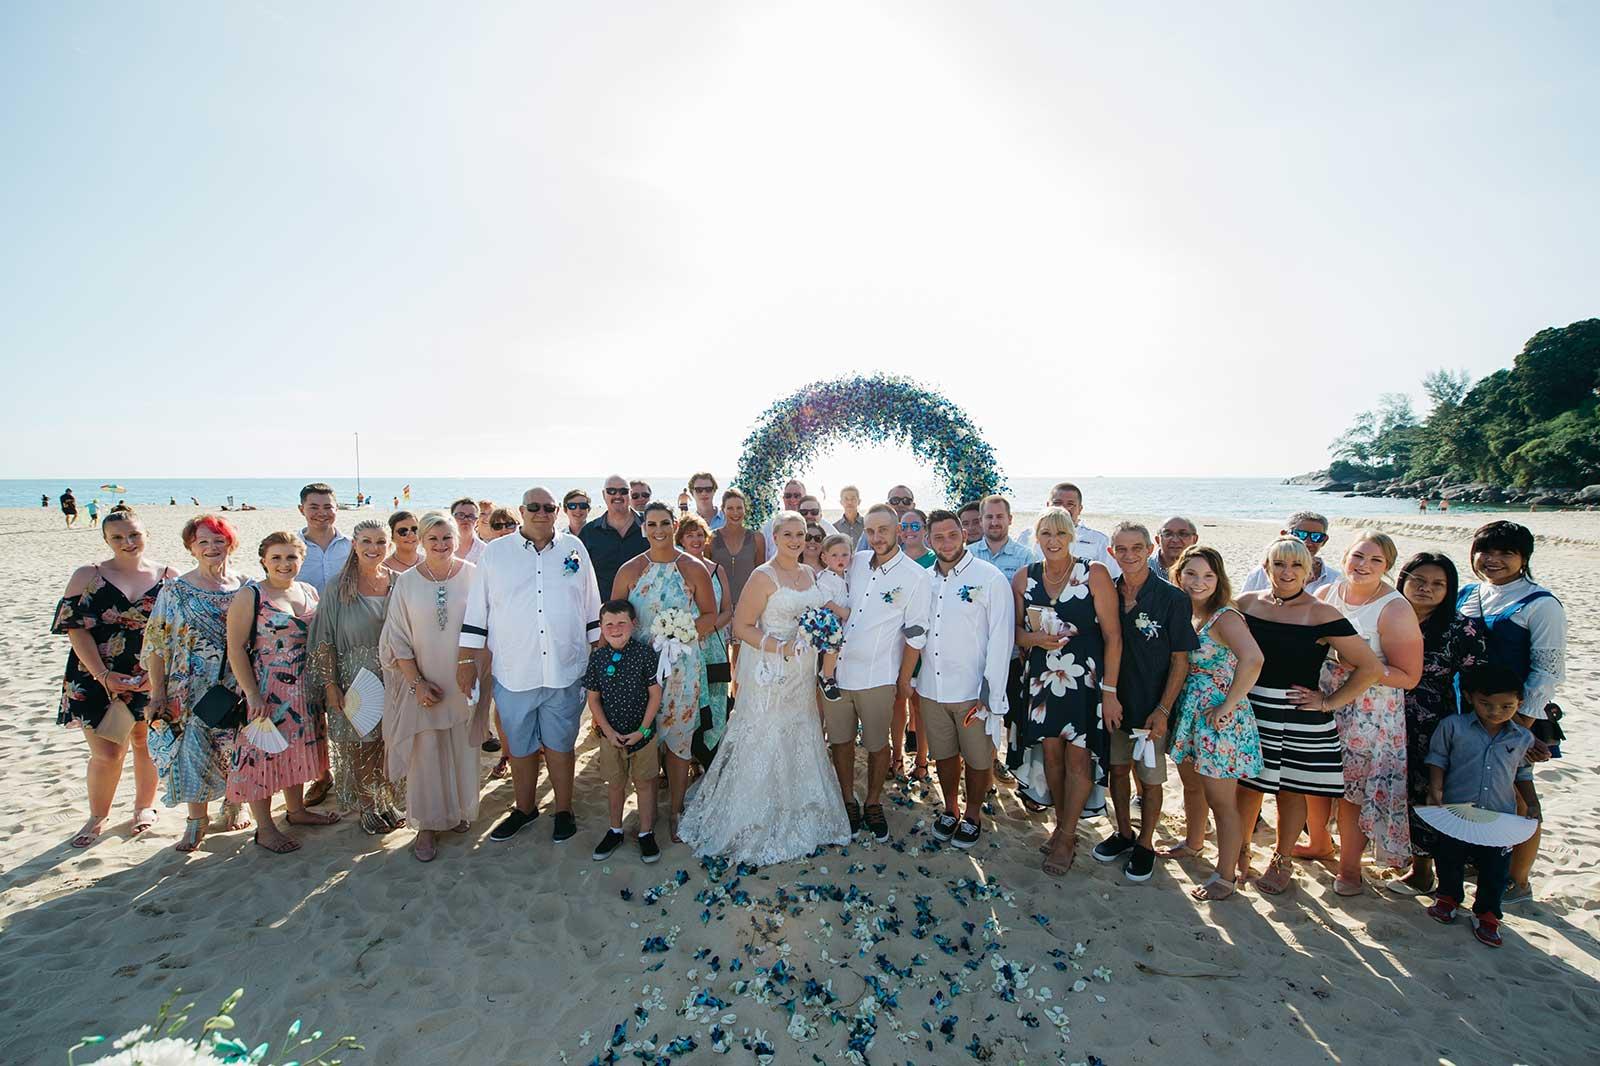 Centara-Grand-Beach-Resort-Kahlia-Luke-Wedding-06